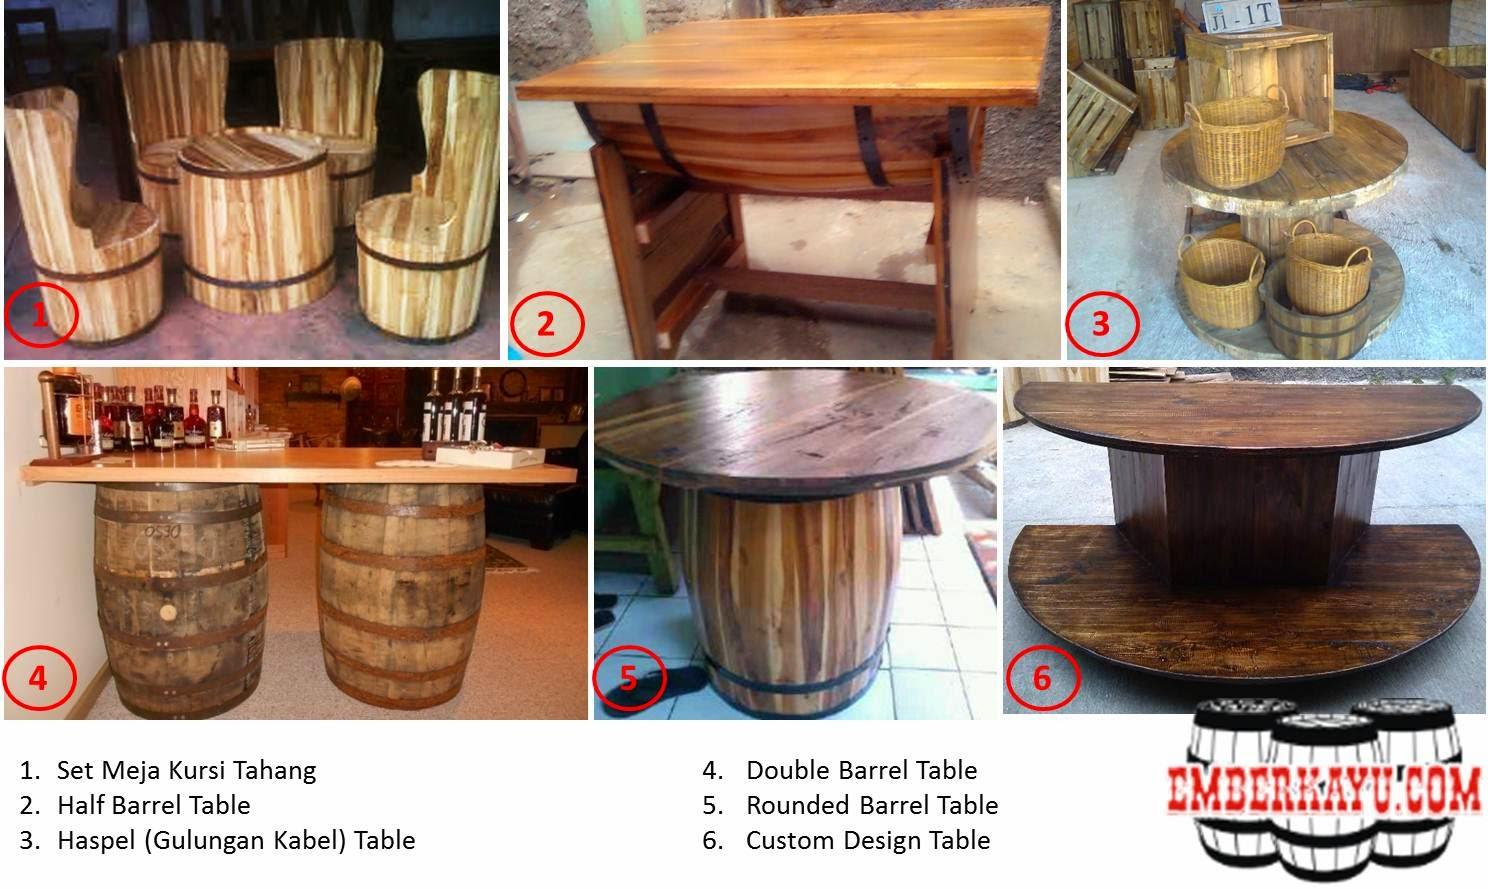 meja kursi tahang, meja kursi barrel, meja kursi antik, meja kursi tong kayu, meja unik, kursi unik, meja kursi vintage